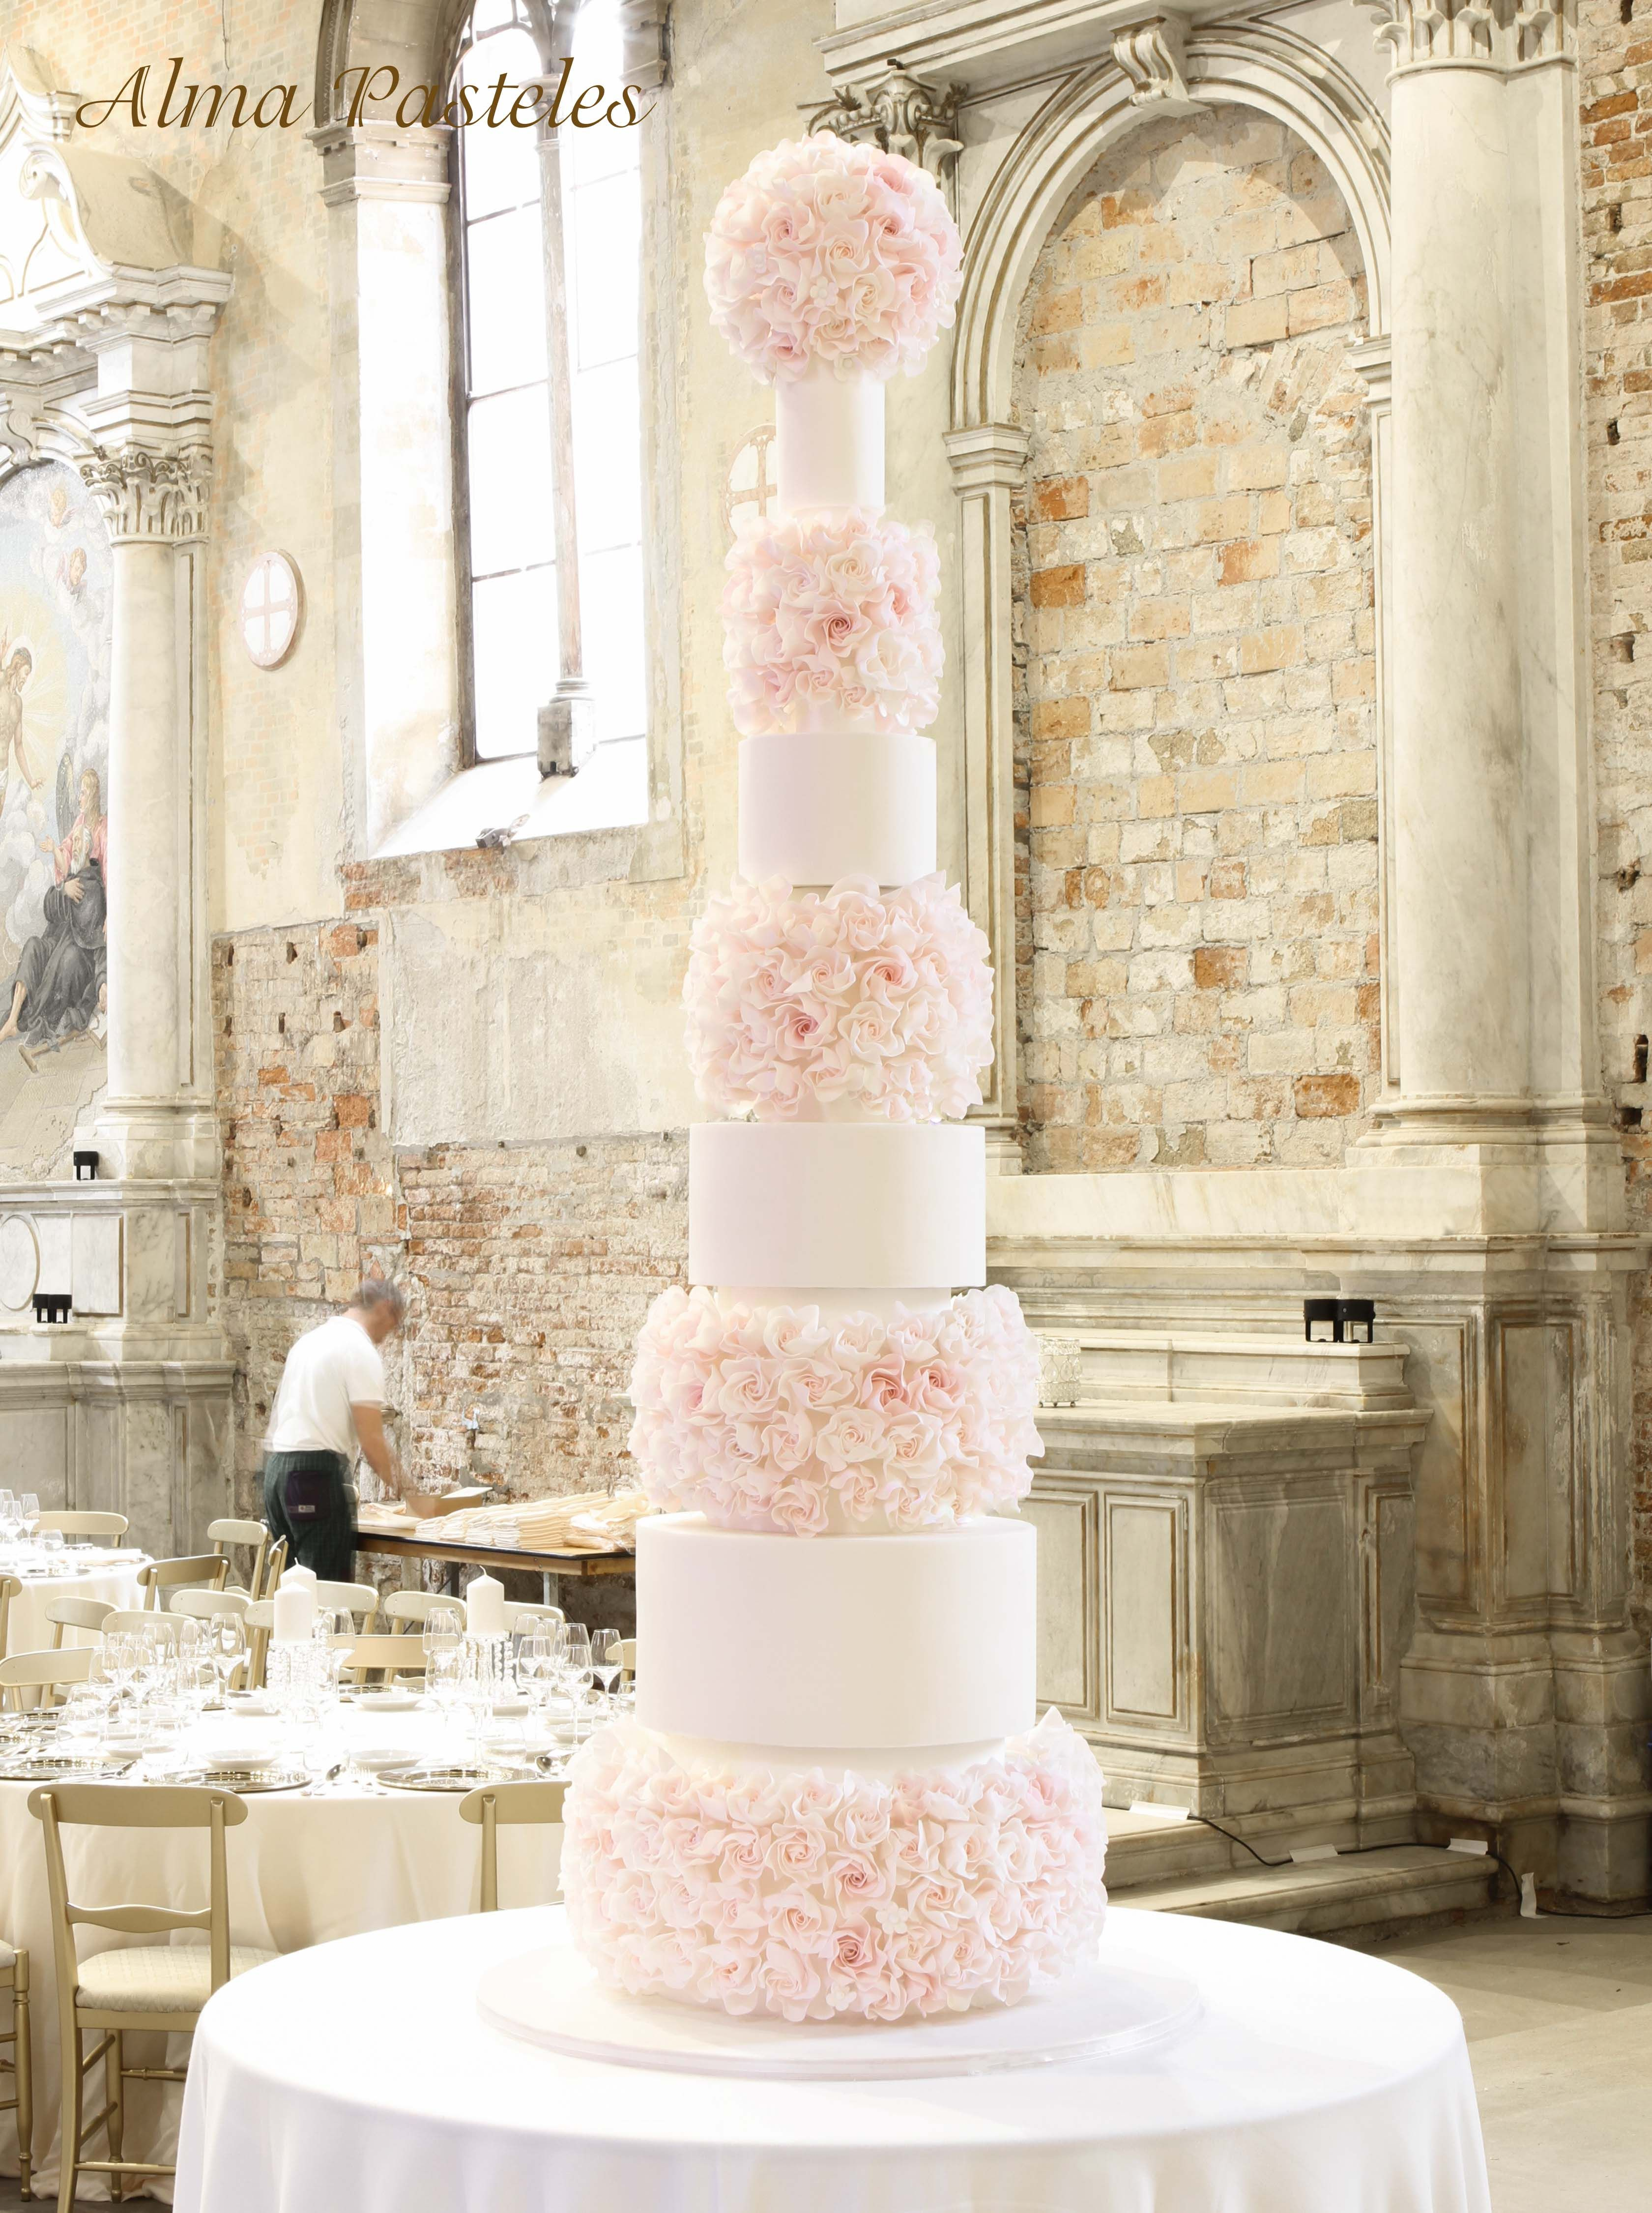 Unique 8 Tier Wedding Cake Frieze - The Wedding Ideas ...